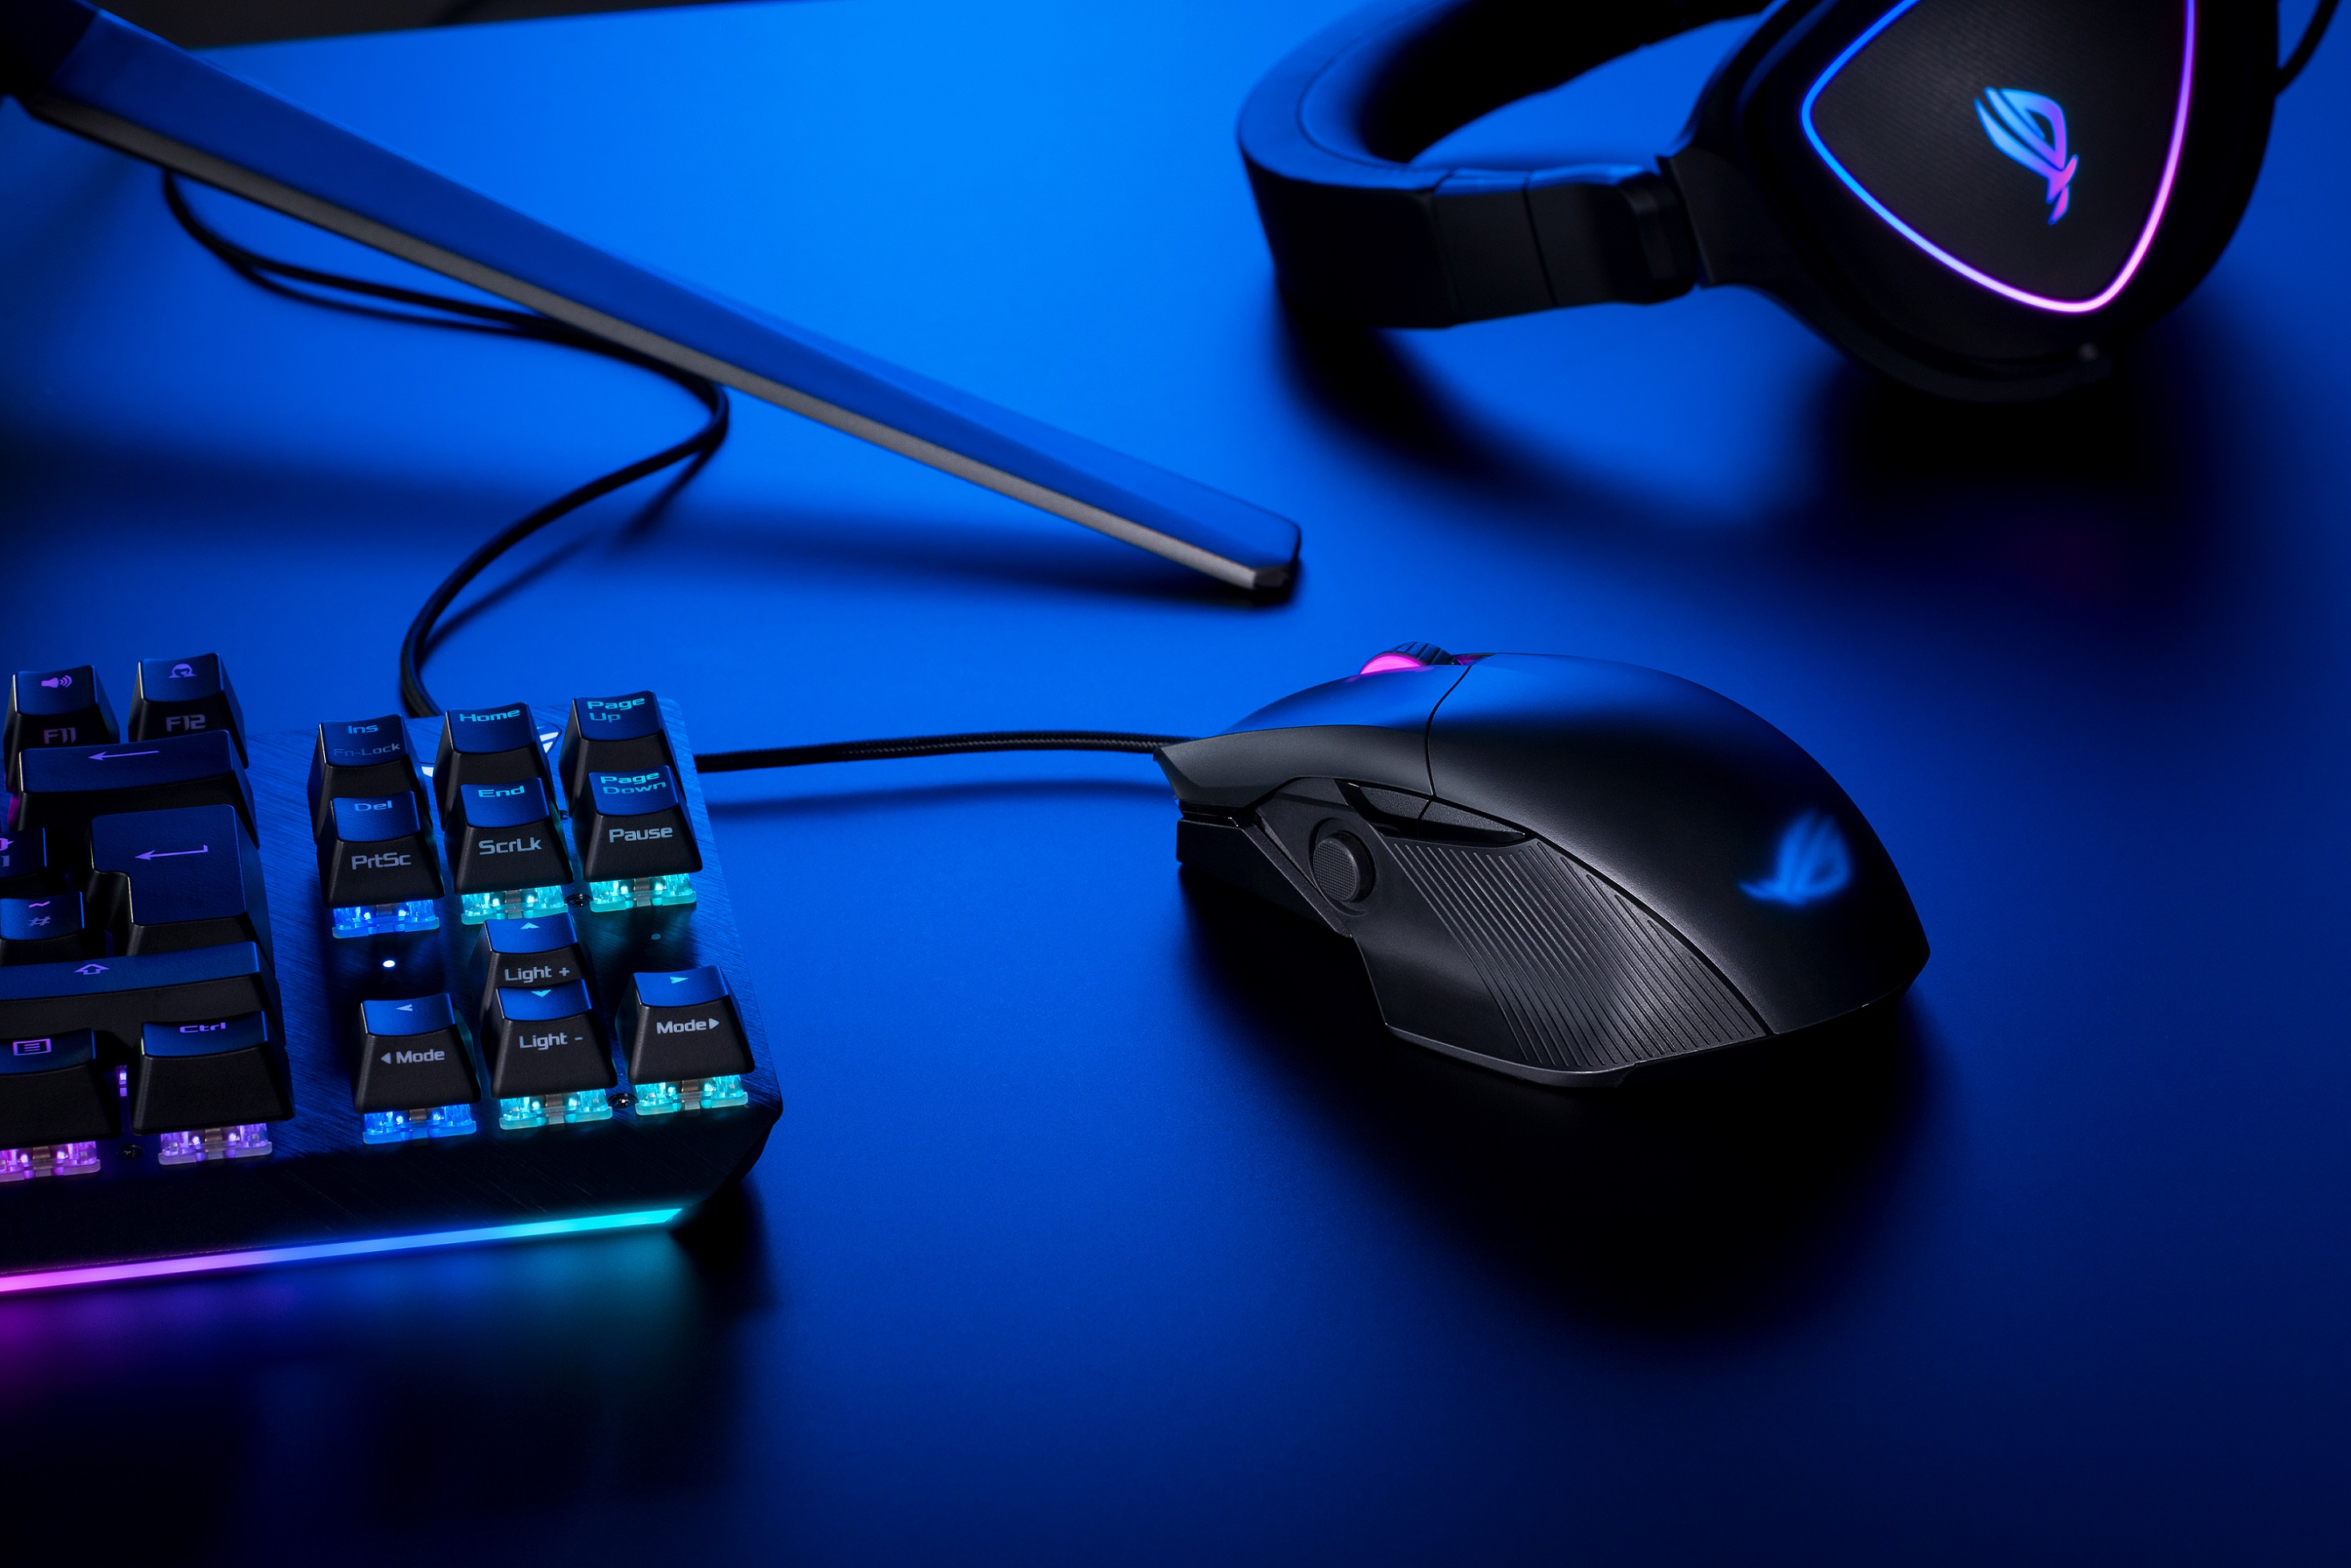 ROG Chakram Core有線光學電競滑鼠搭載可編程、可拆卸的搖桿,提供類比與數位兩種模式,可根據遊戲需求配對不同指令,提升遊戲操作力。